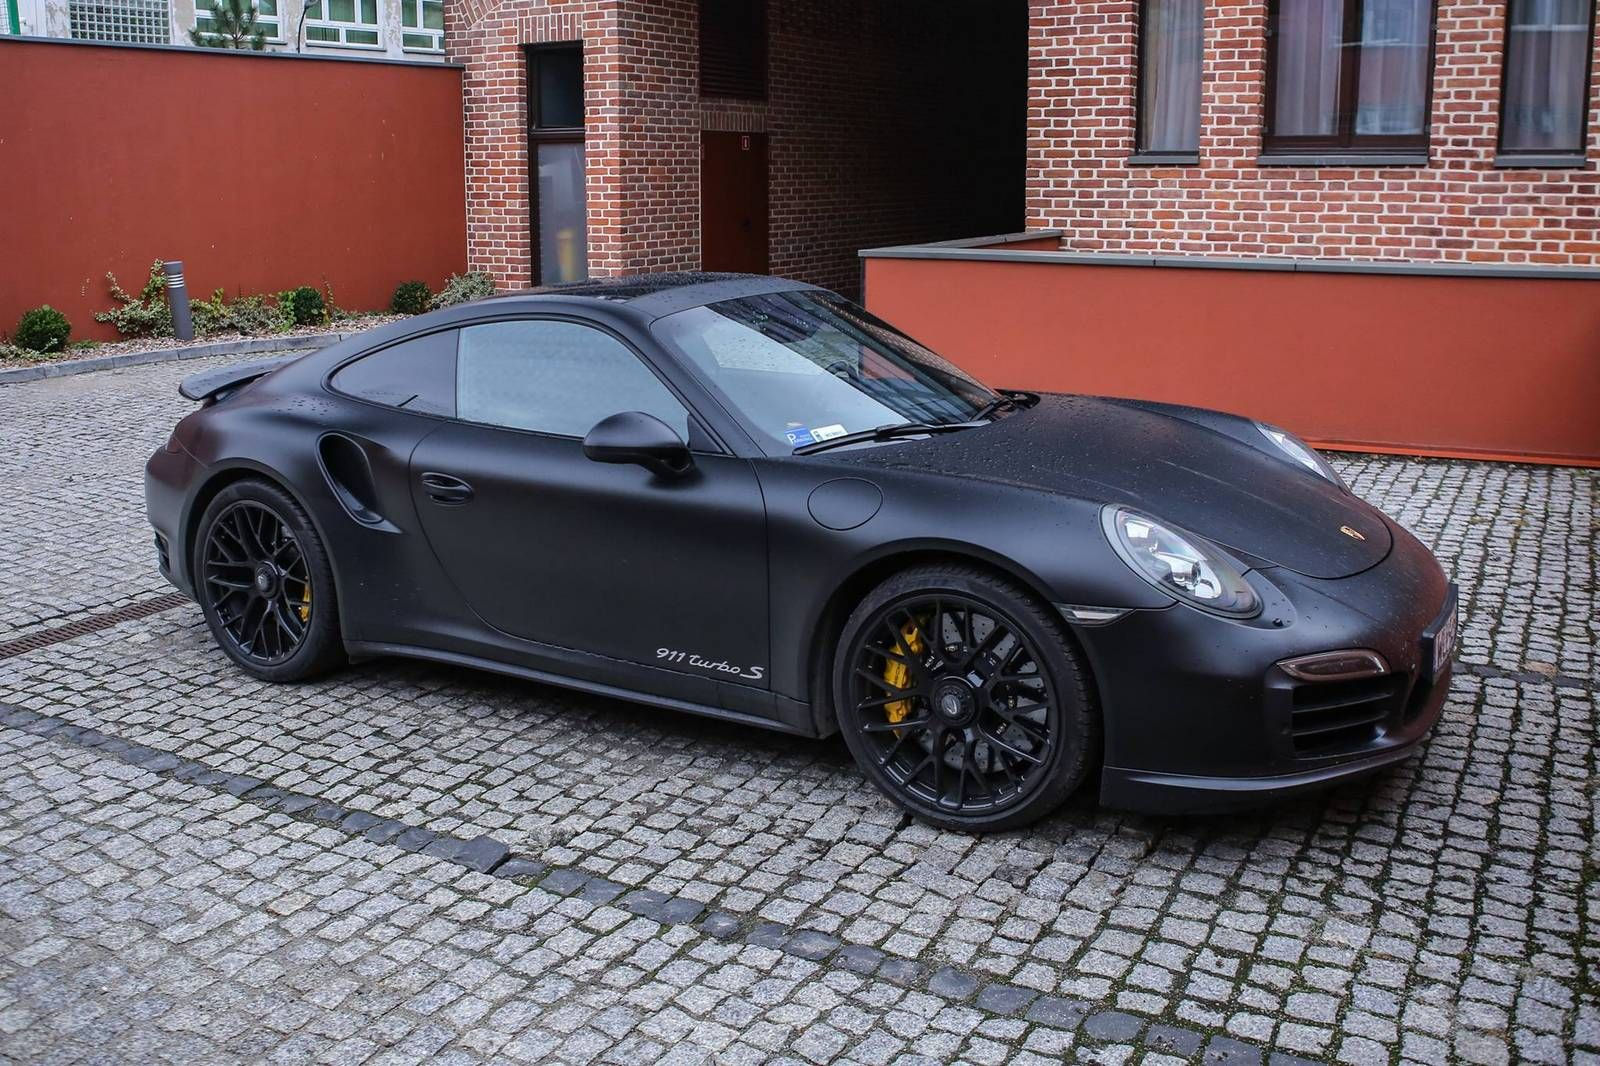 2016 porsche 911 turbo s matte black photos